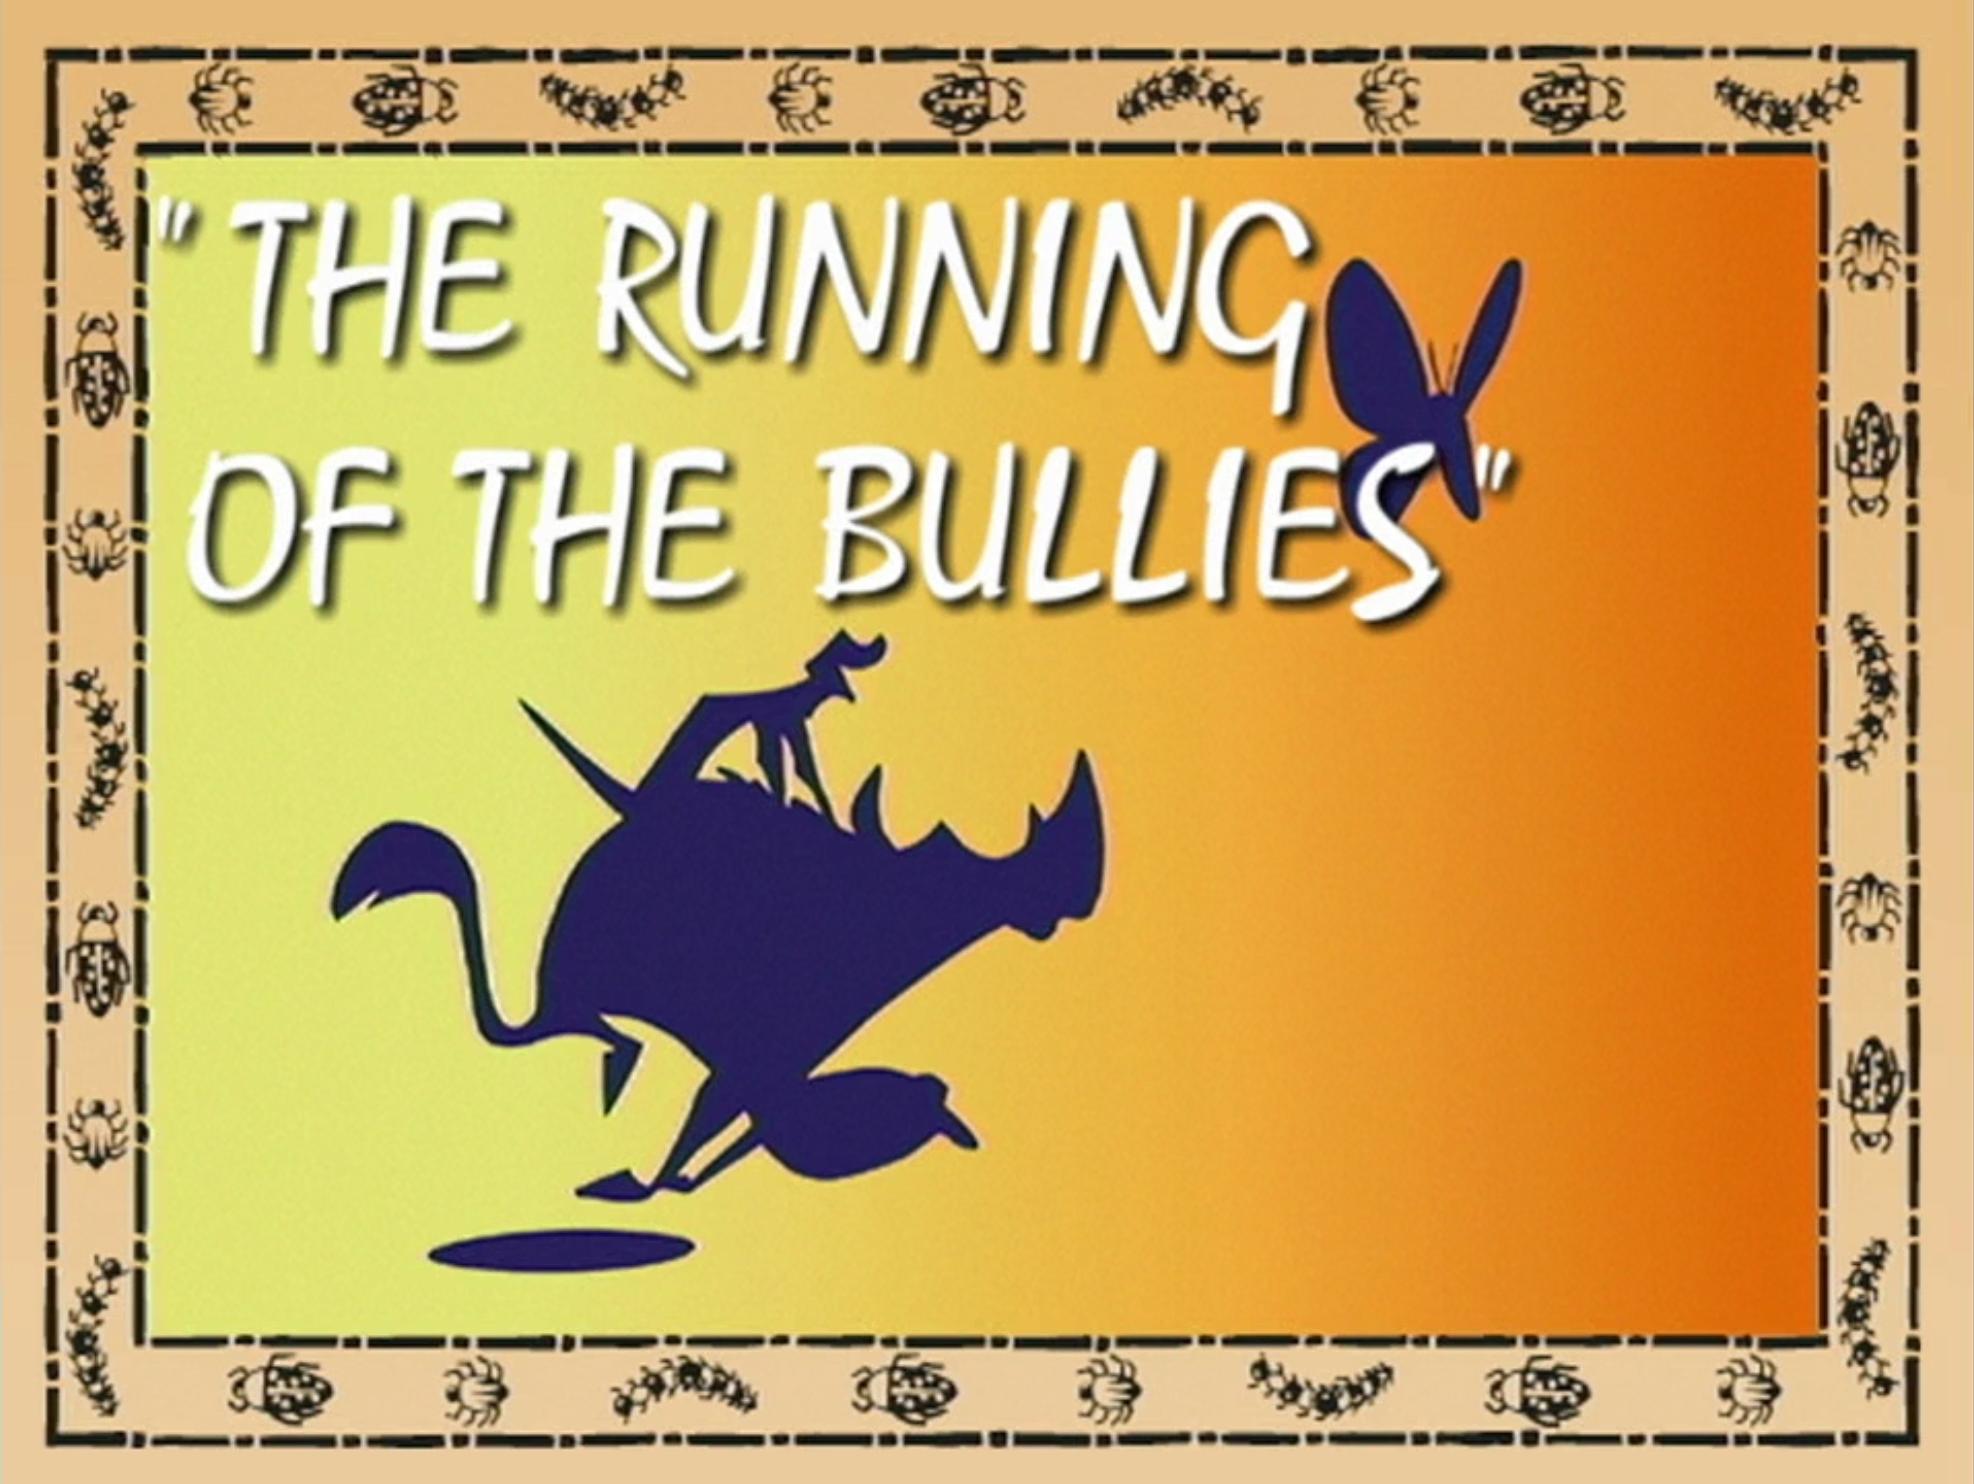 The Running of the Bullies